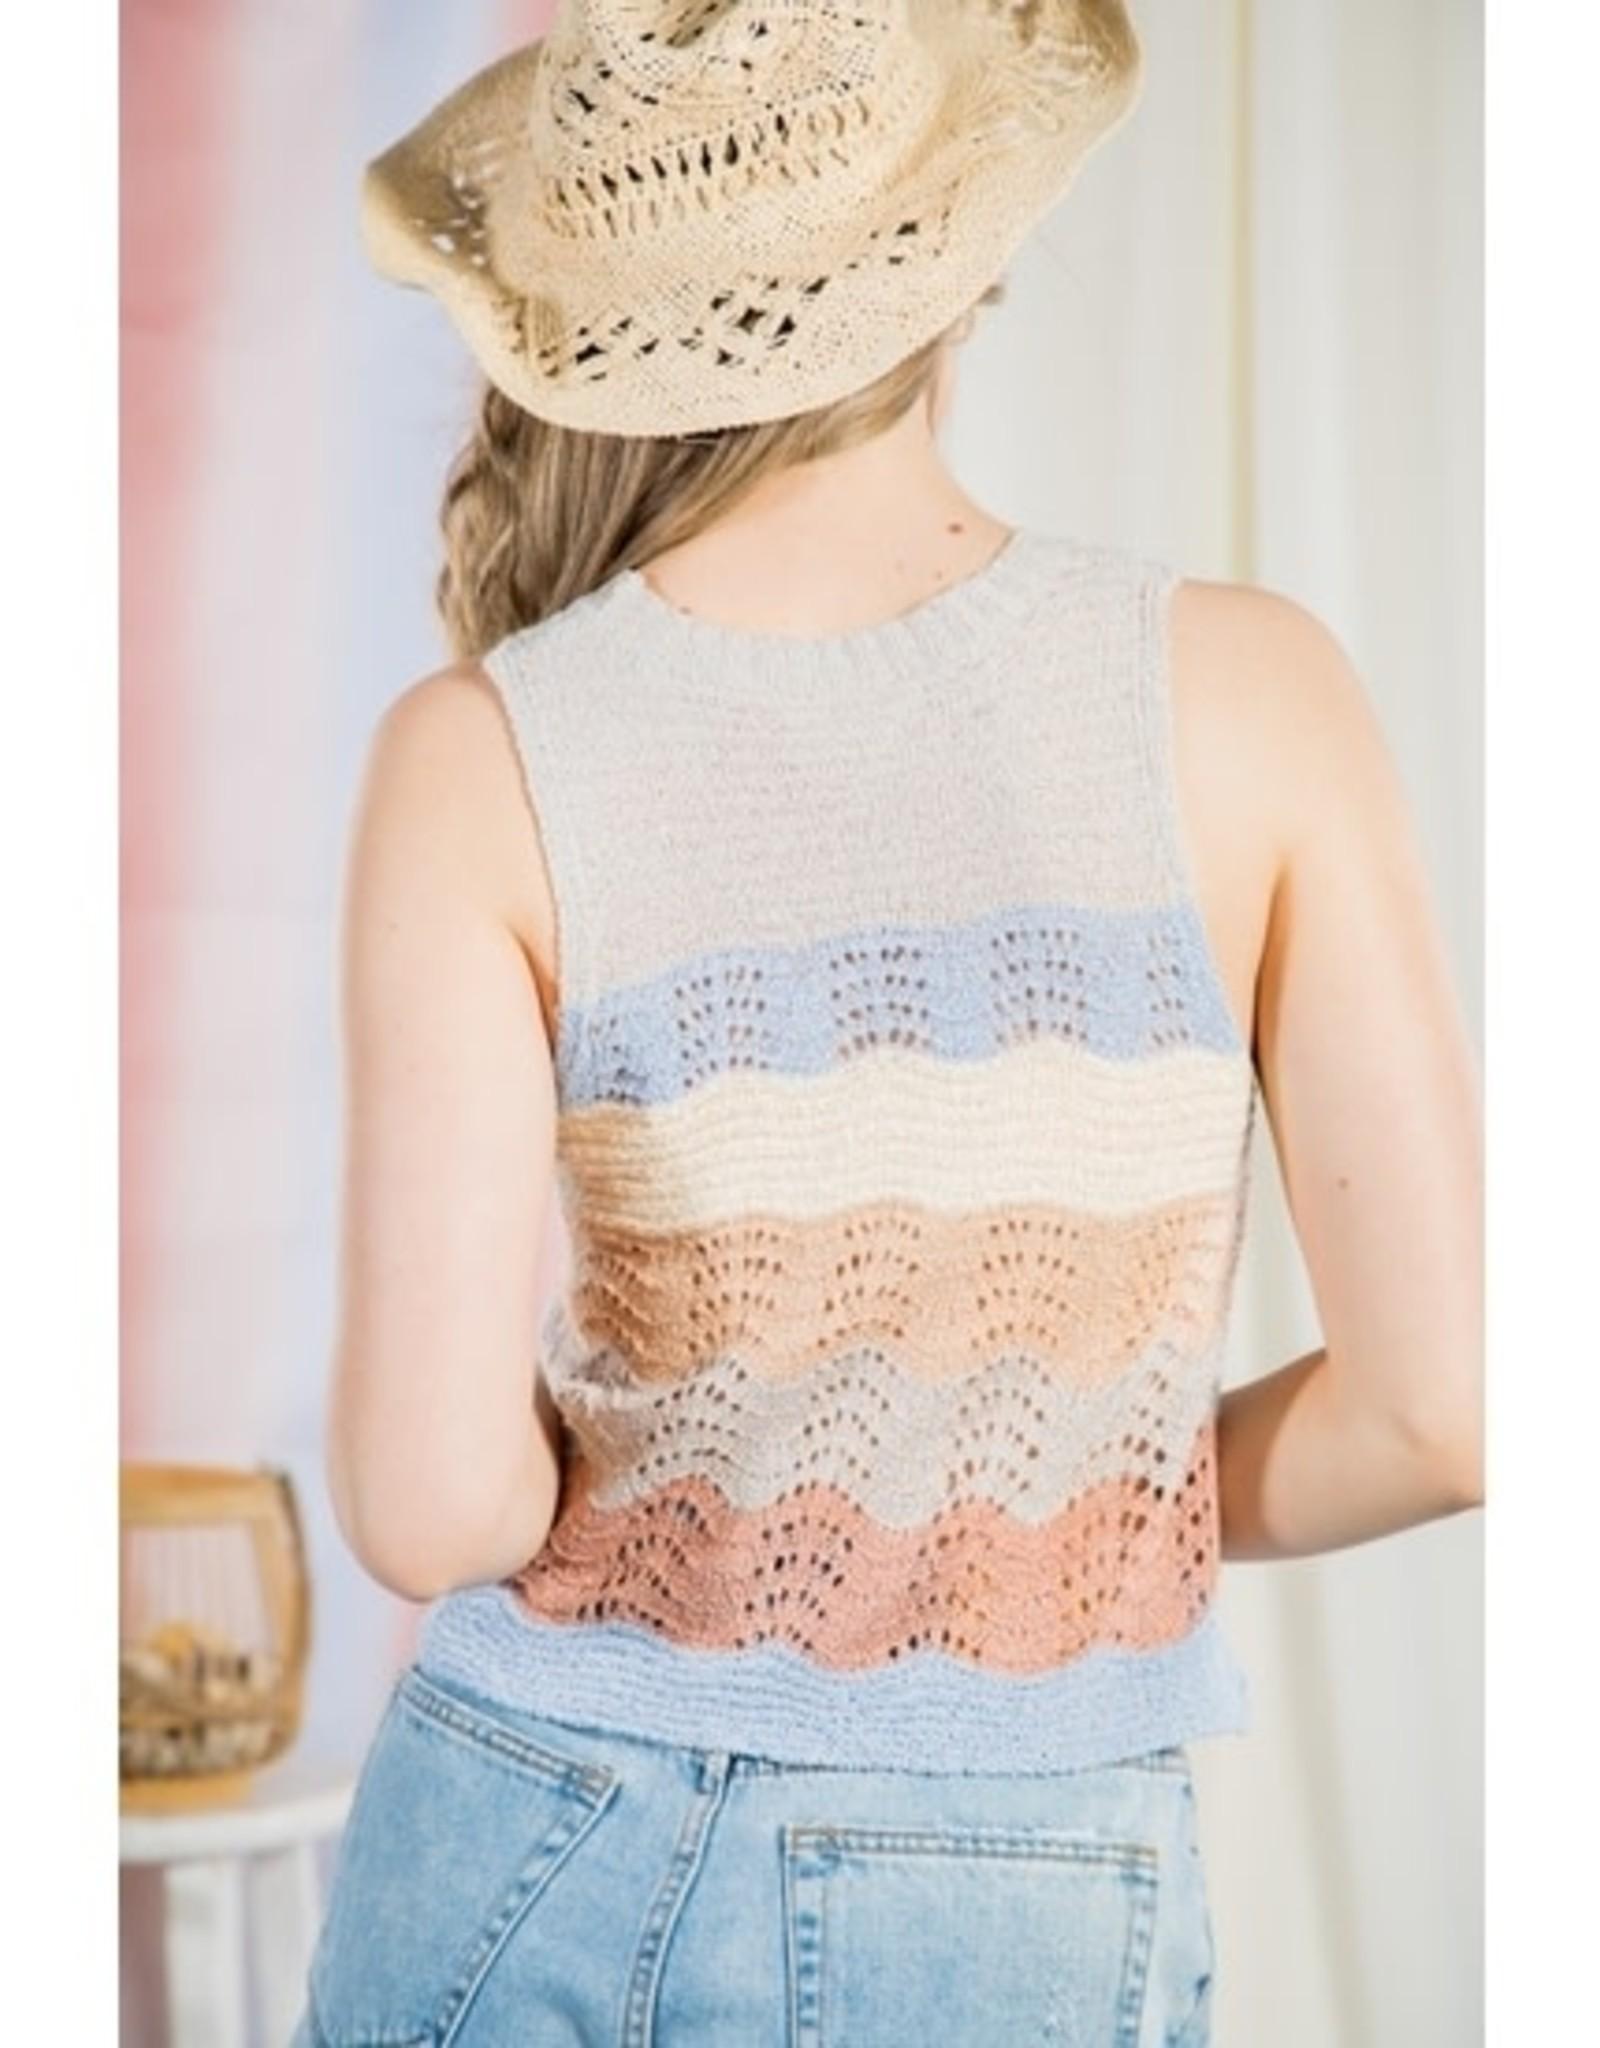 Crochet-knit Tank-crop Top